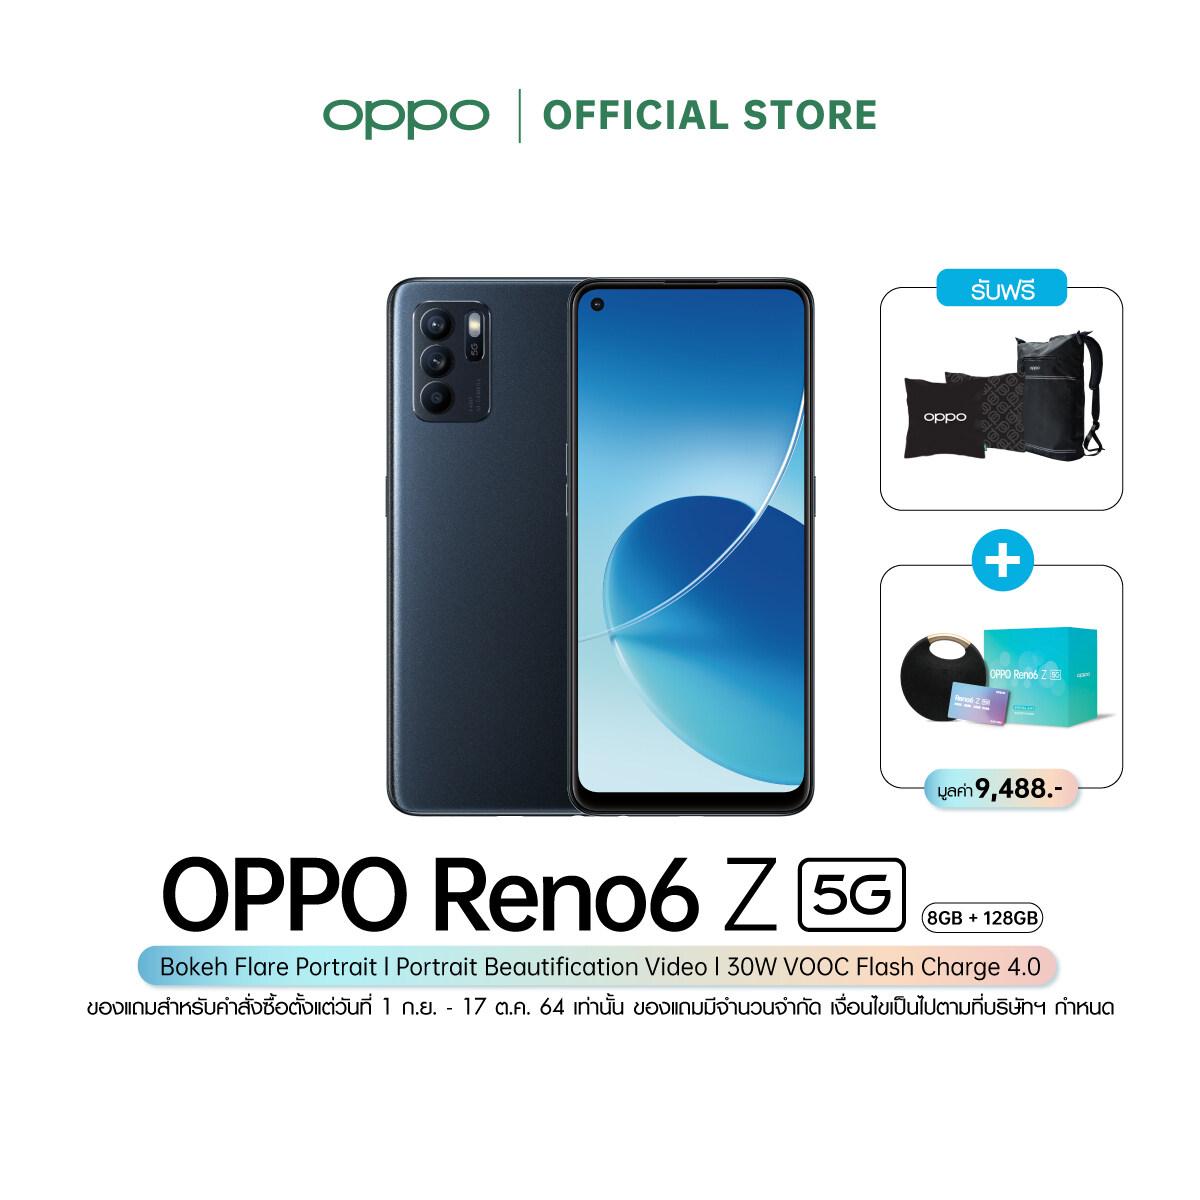 [New] OPPO Reno6 Z 5G (8+128) โทรศัพท์มือถือ กล้องหลัง 64 ล้านพิกเซล หน้าจอ 6.43 นิ้ว พร้อมของแถม รับประกัน 12 เดือน